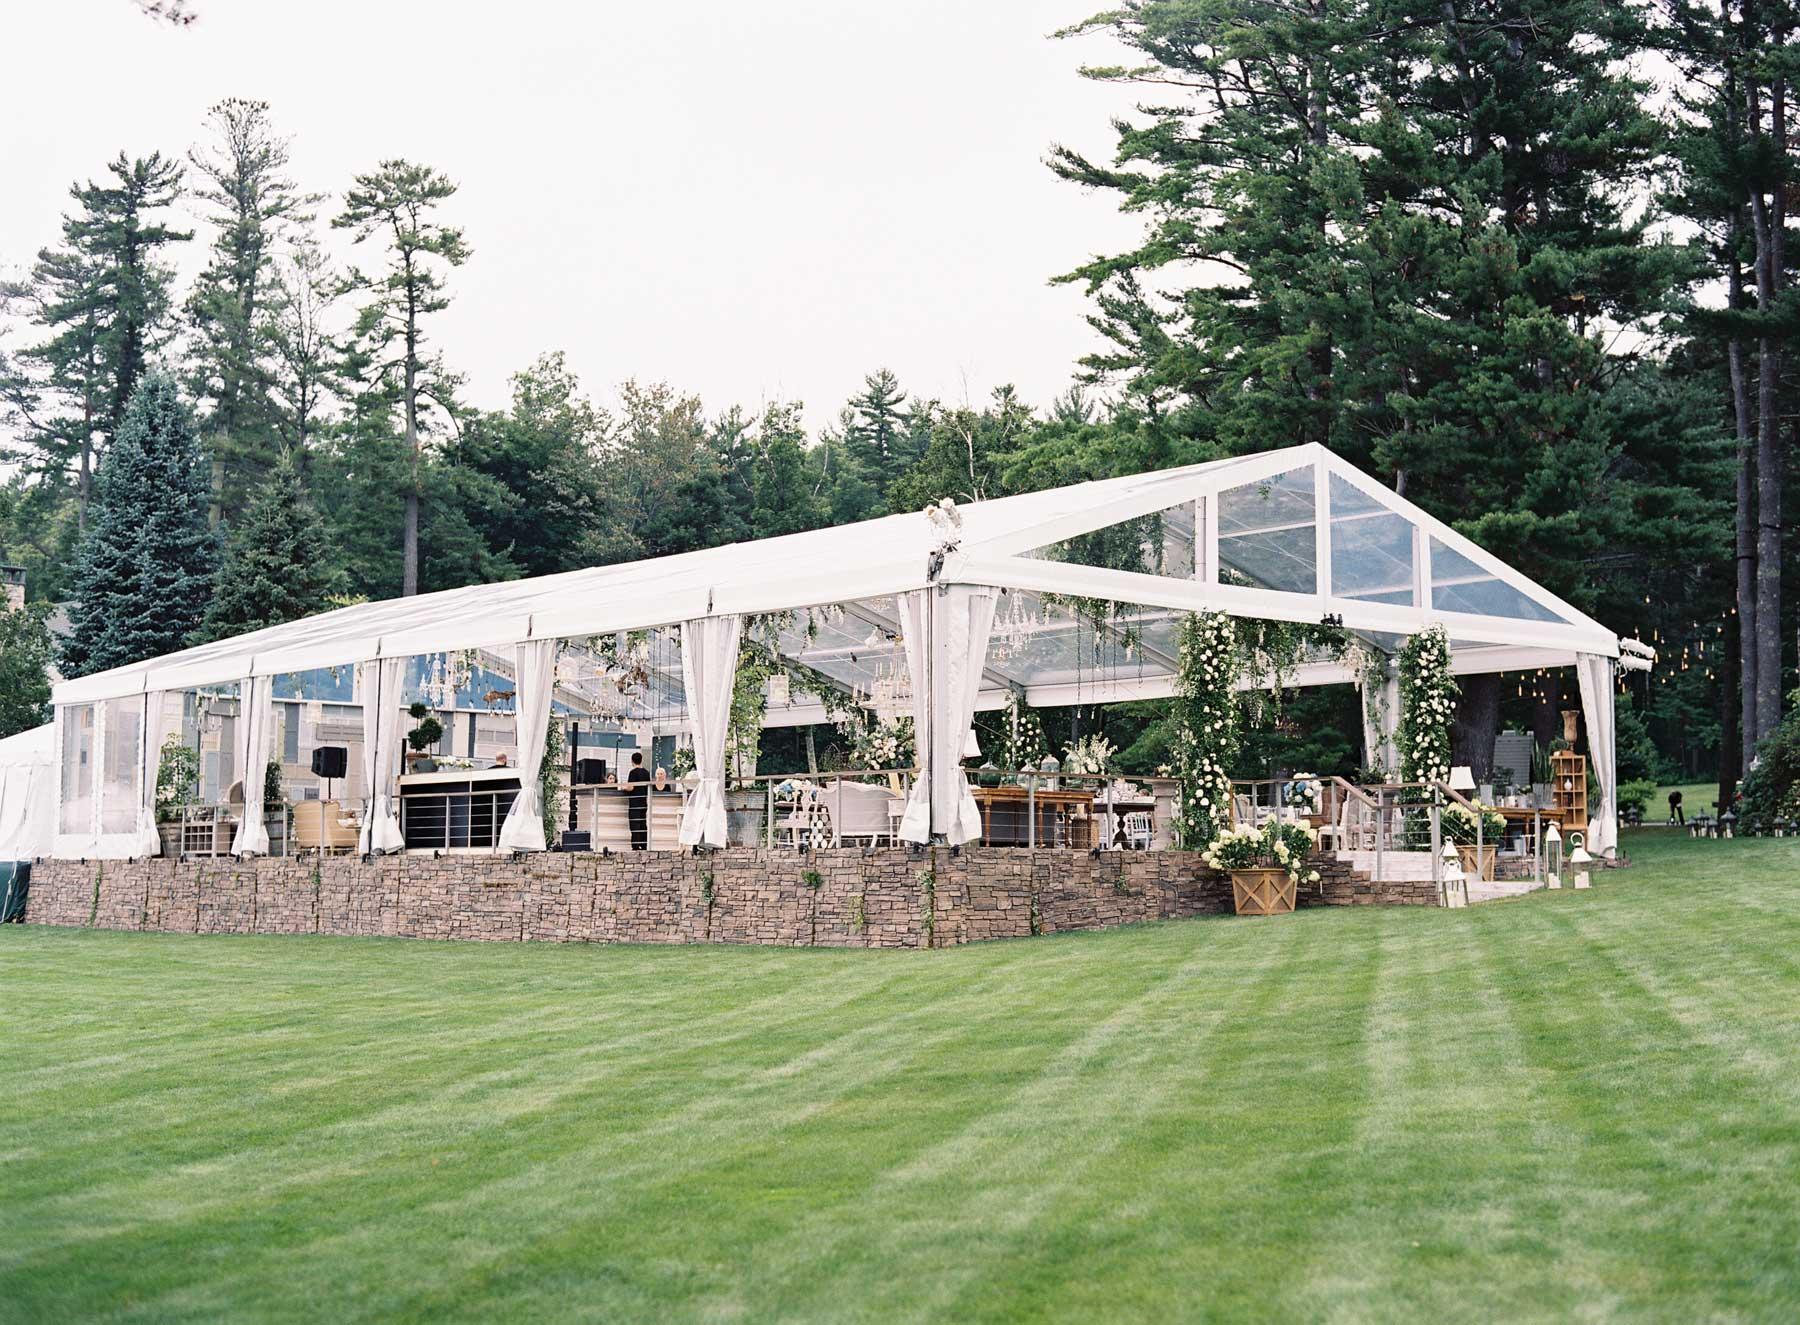 Wedding reception at private home estate tent wedding start from scratch wedding ideas backyard wedding